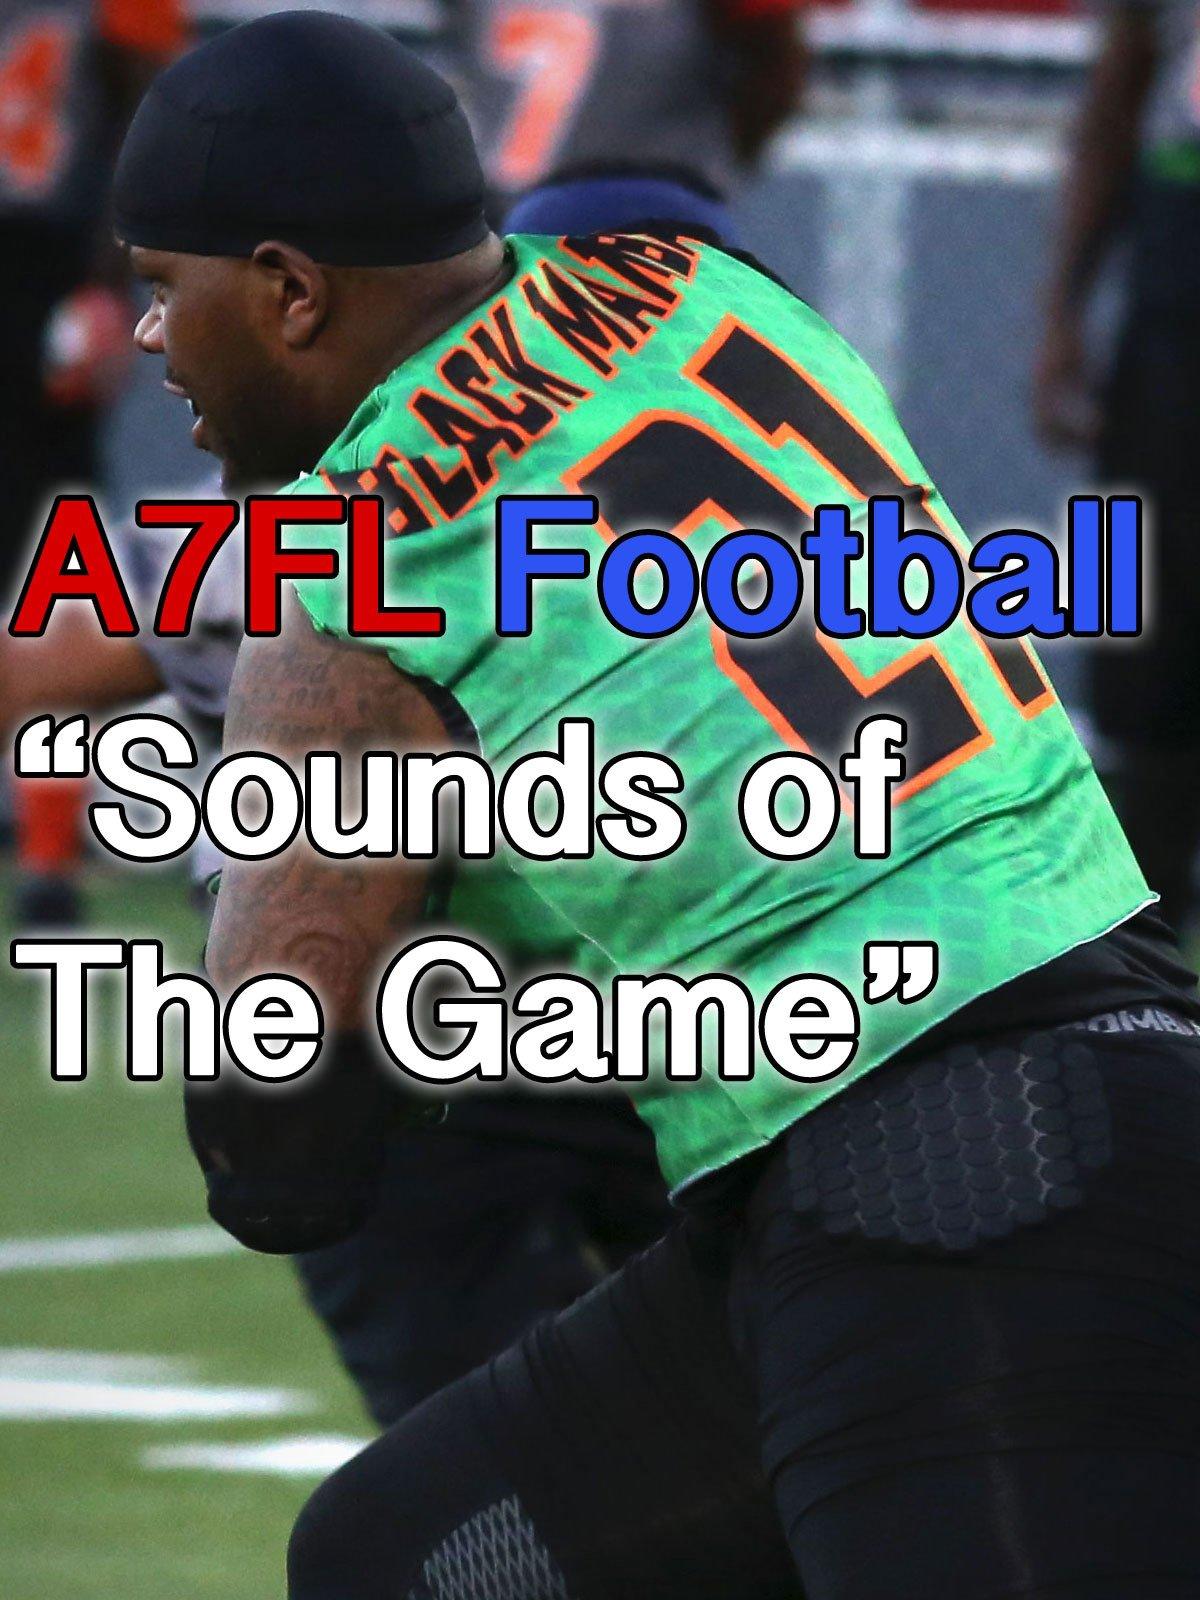 A7FL Football